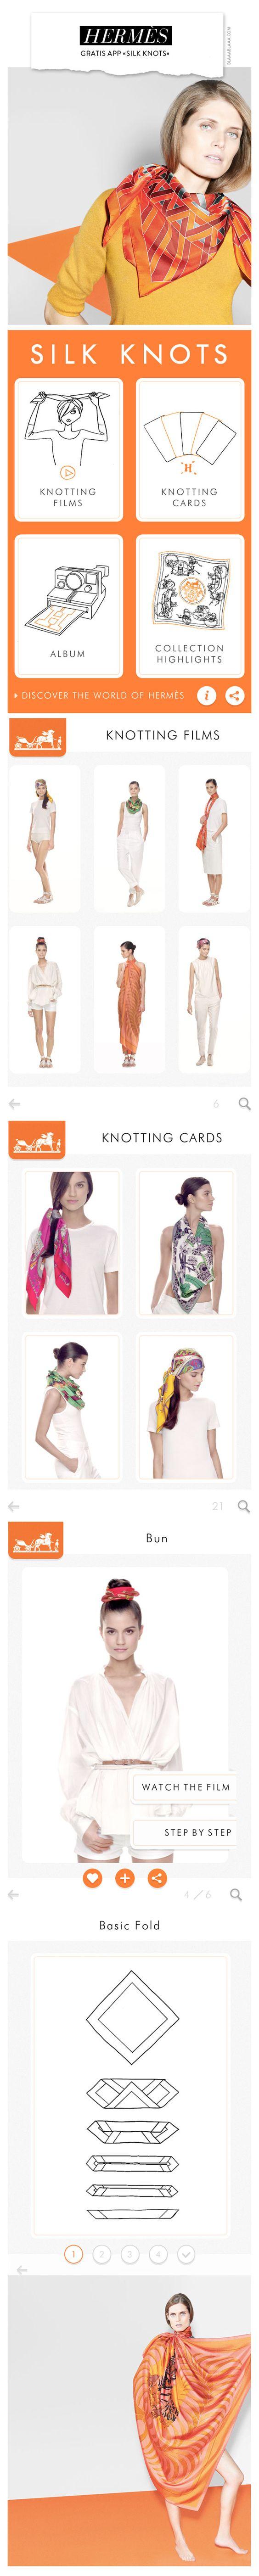 Hermès App «Silk Knots» | The House of Beccaria~